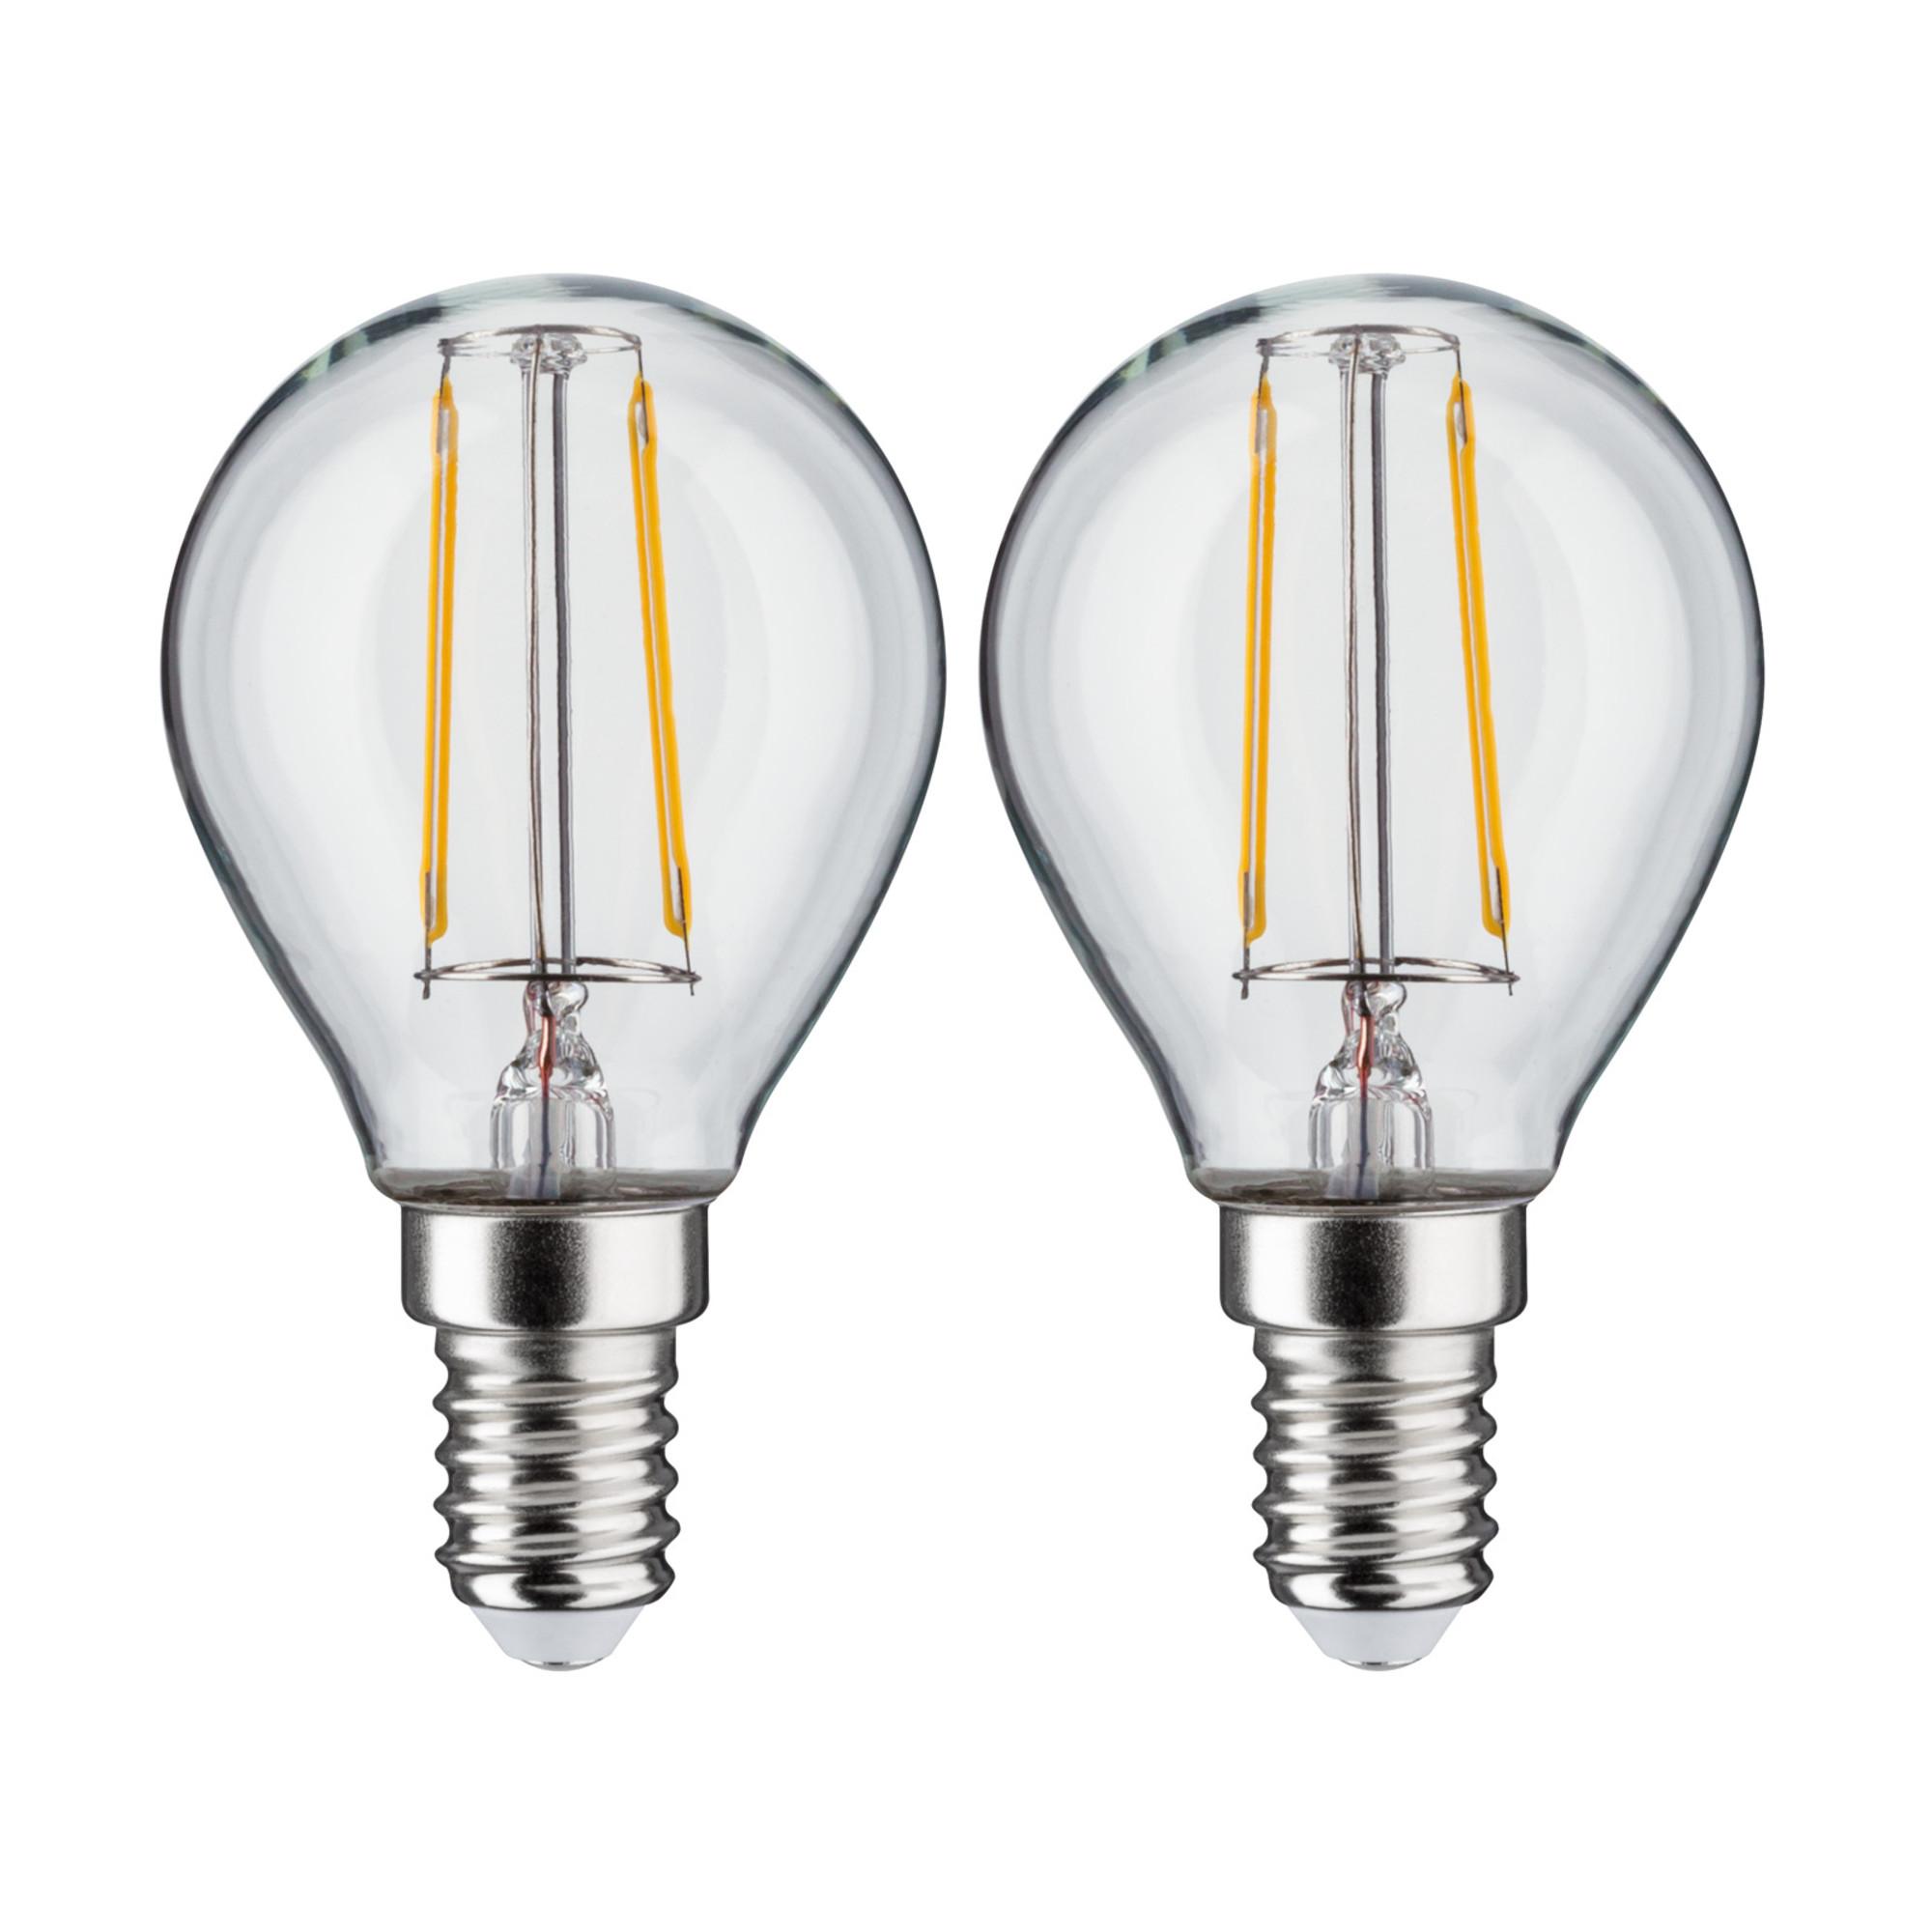 Лампа филаментная Paulmann Капля 2.5Вт 250лм 2700К Е14 230В Прозрачный Набор 2шт. 28476.